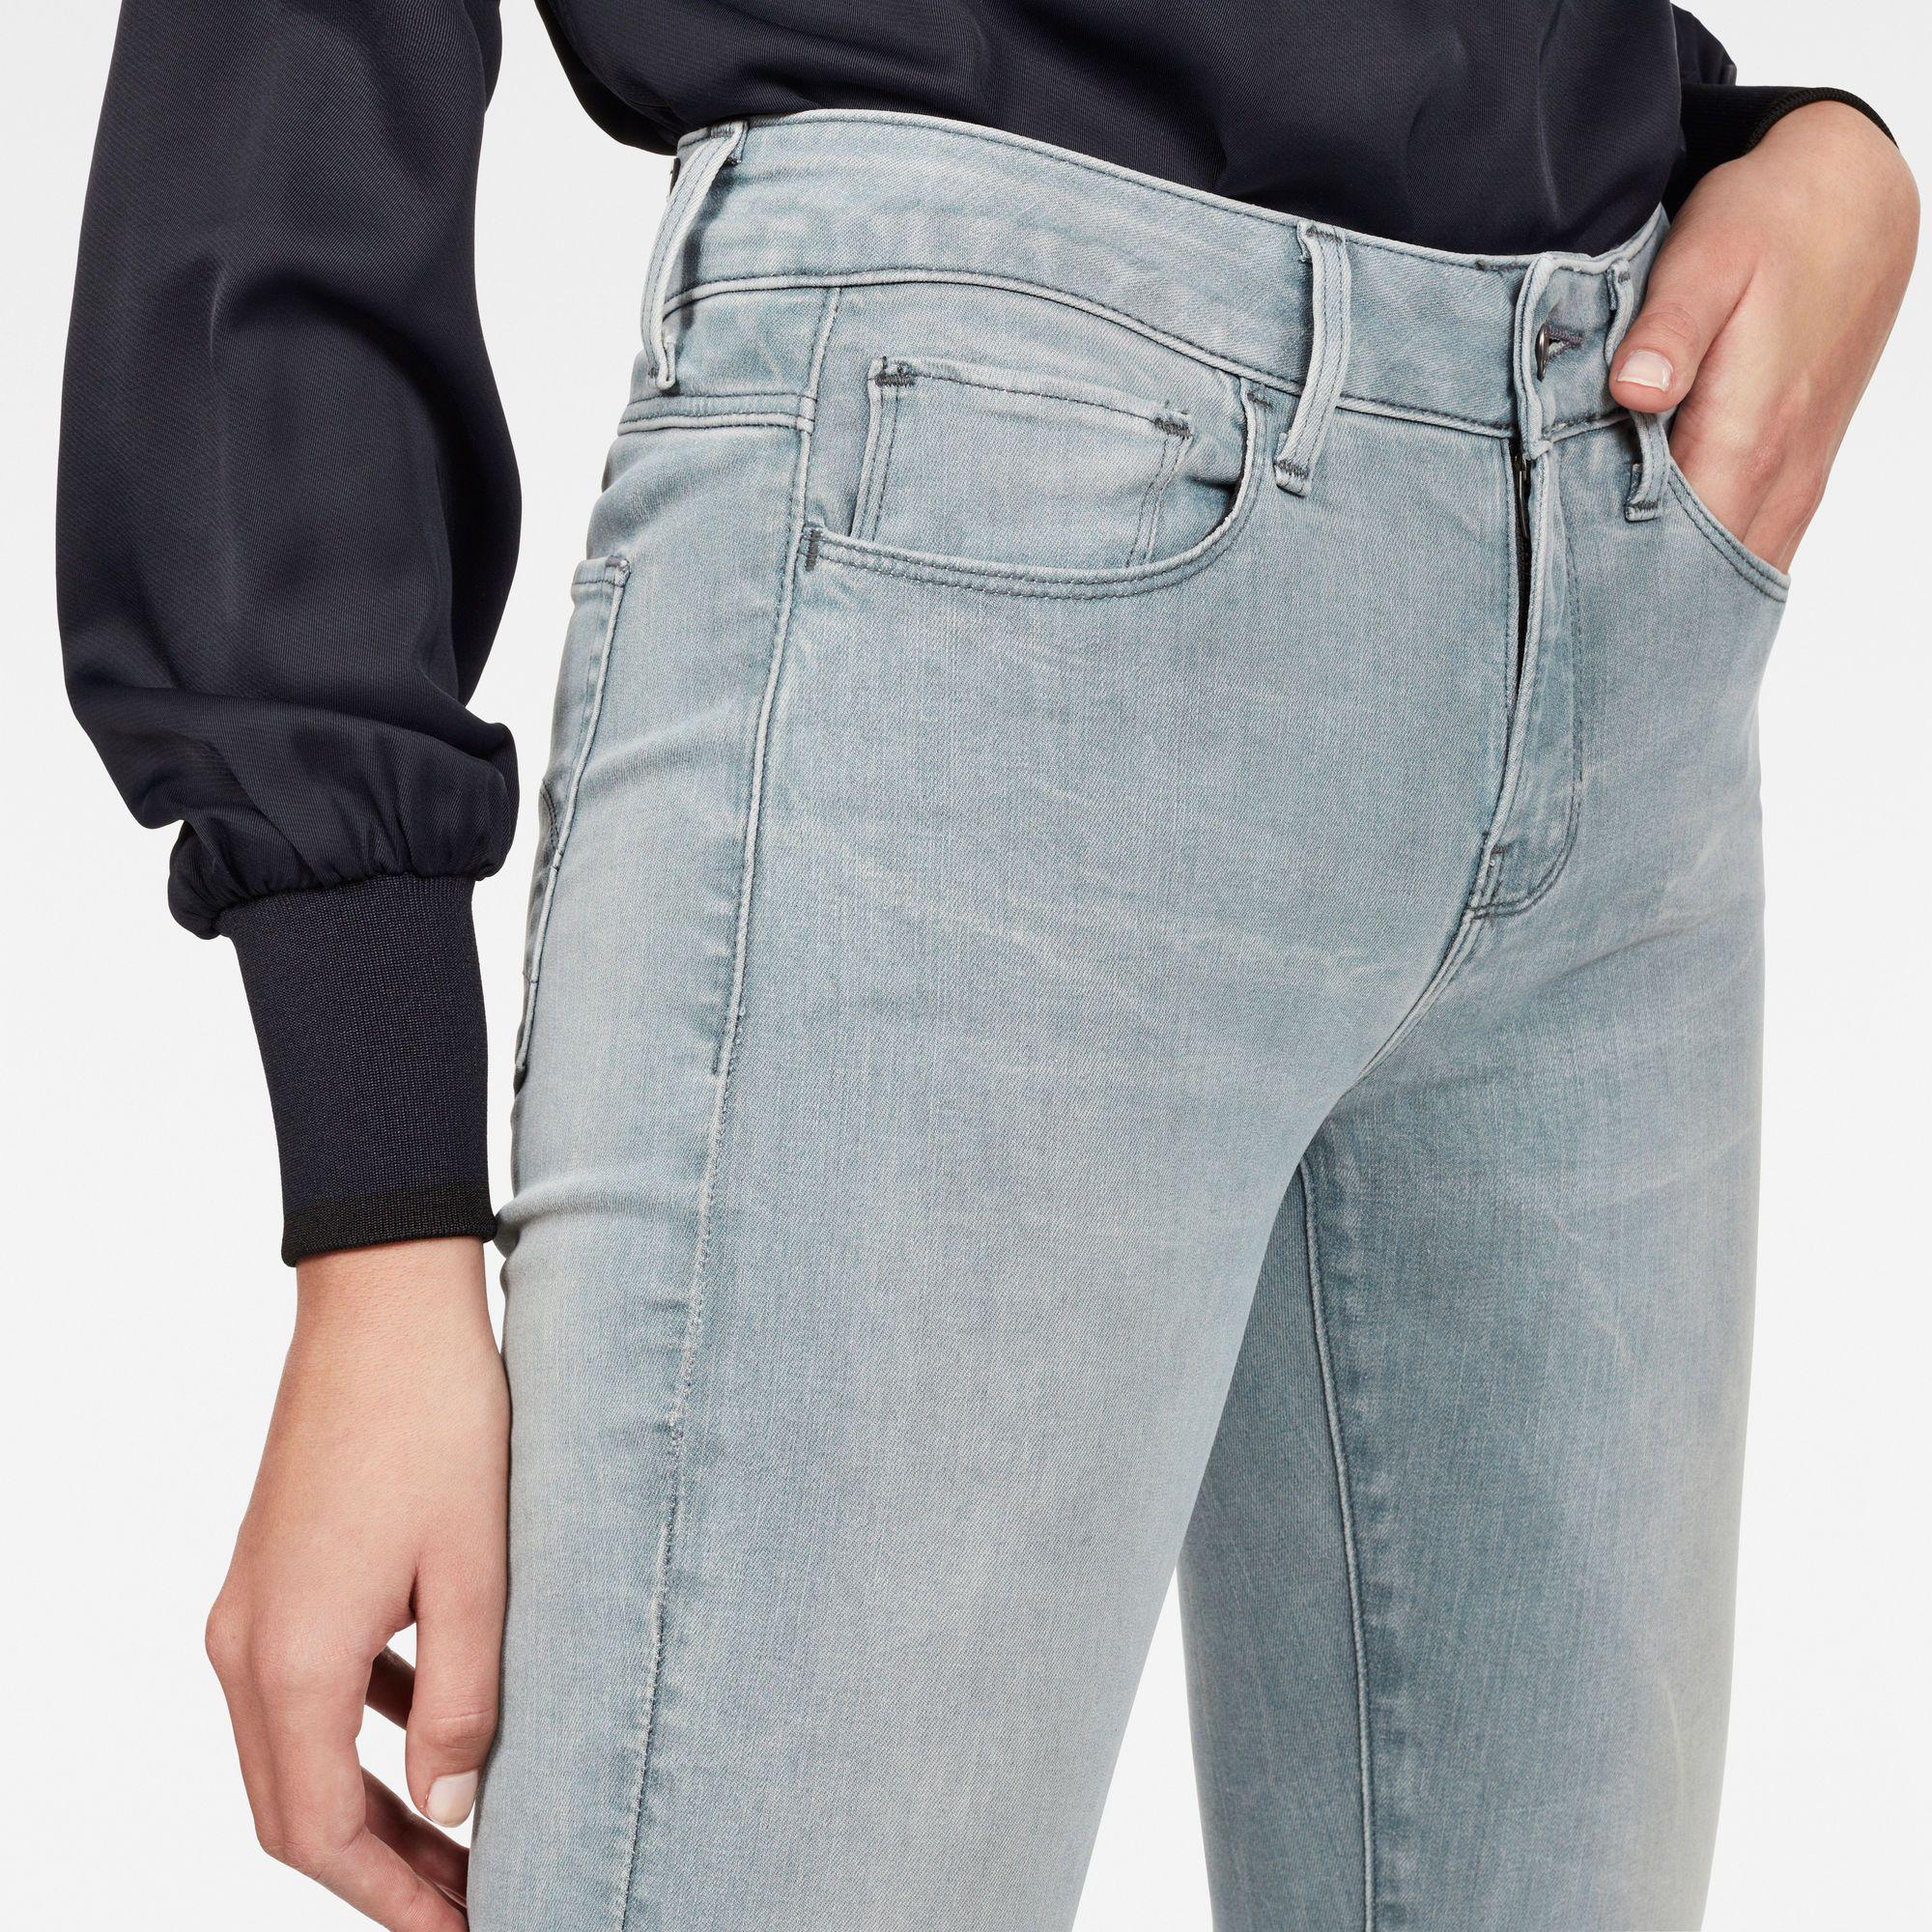 G-Star RAW 3301 Mid Waist Skinny Jeans